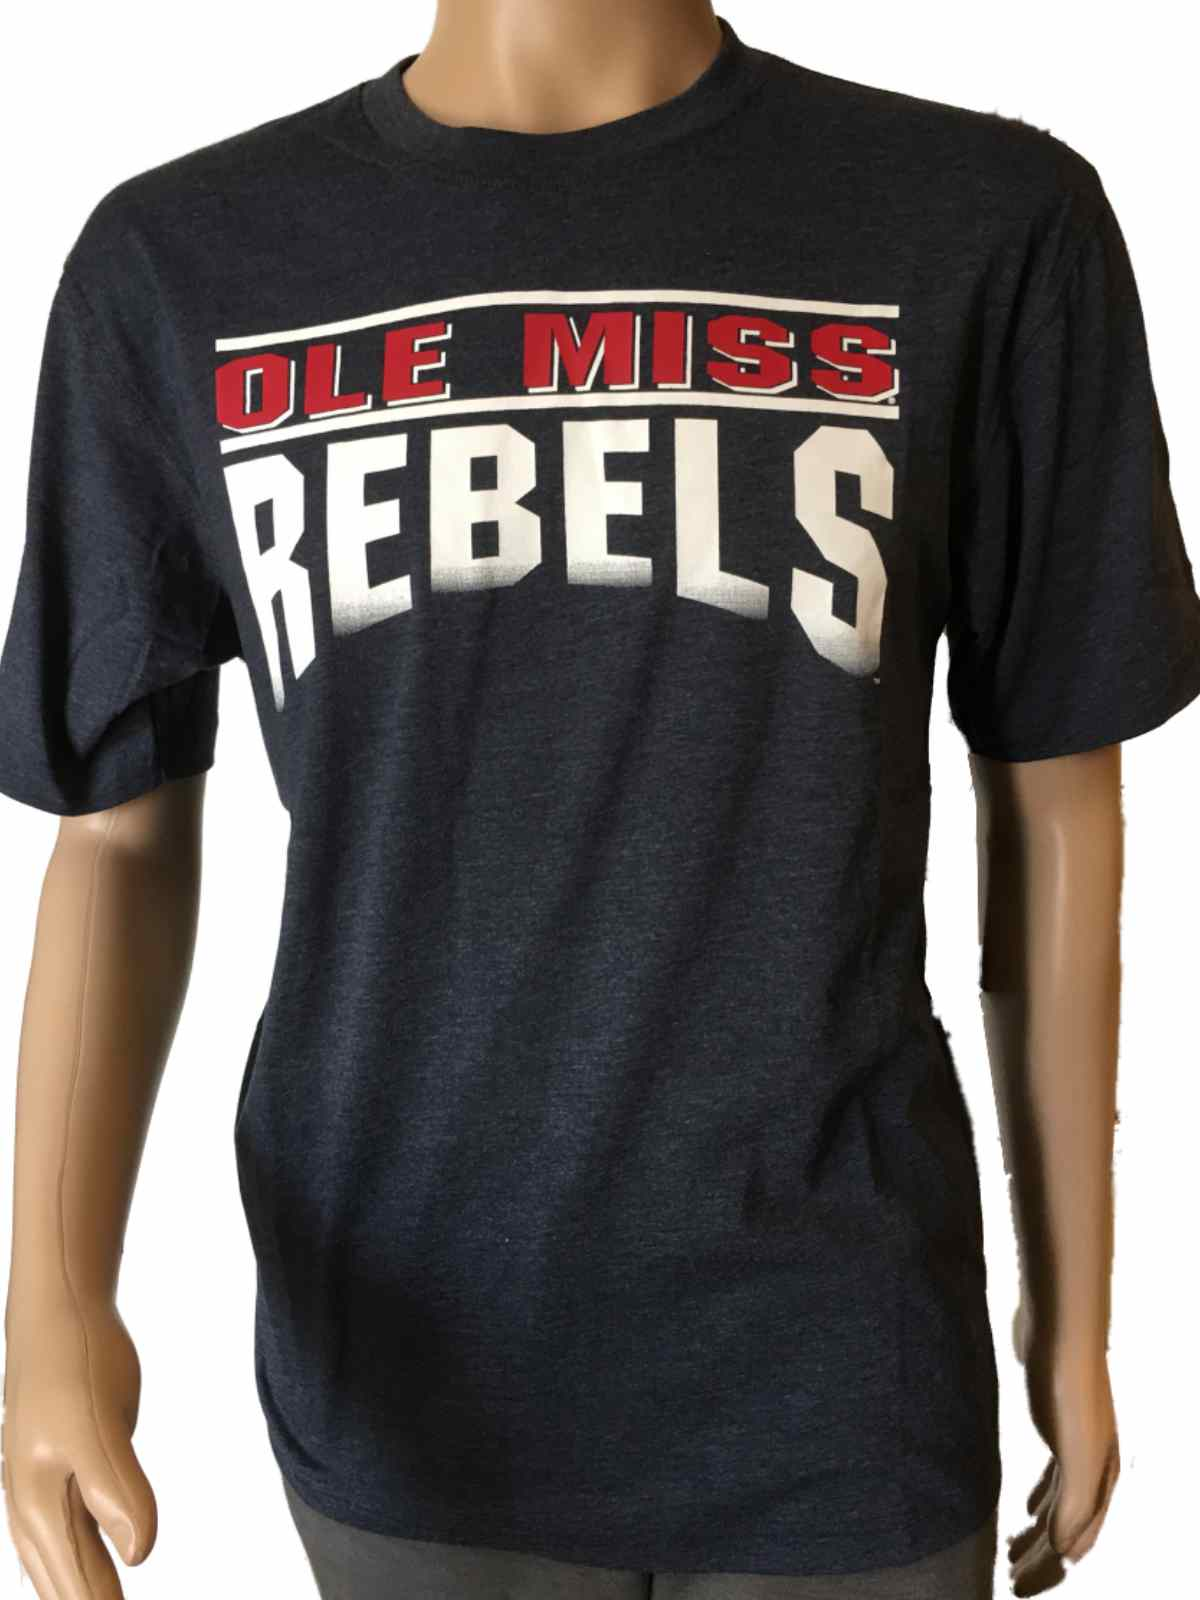 Ole Miss Rebels Colosseum Blue Crunch Frontline Short Sleeve T-Shirt ... f72fc94e6